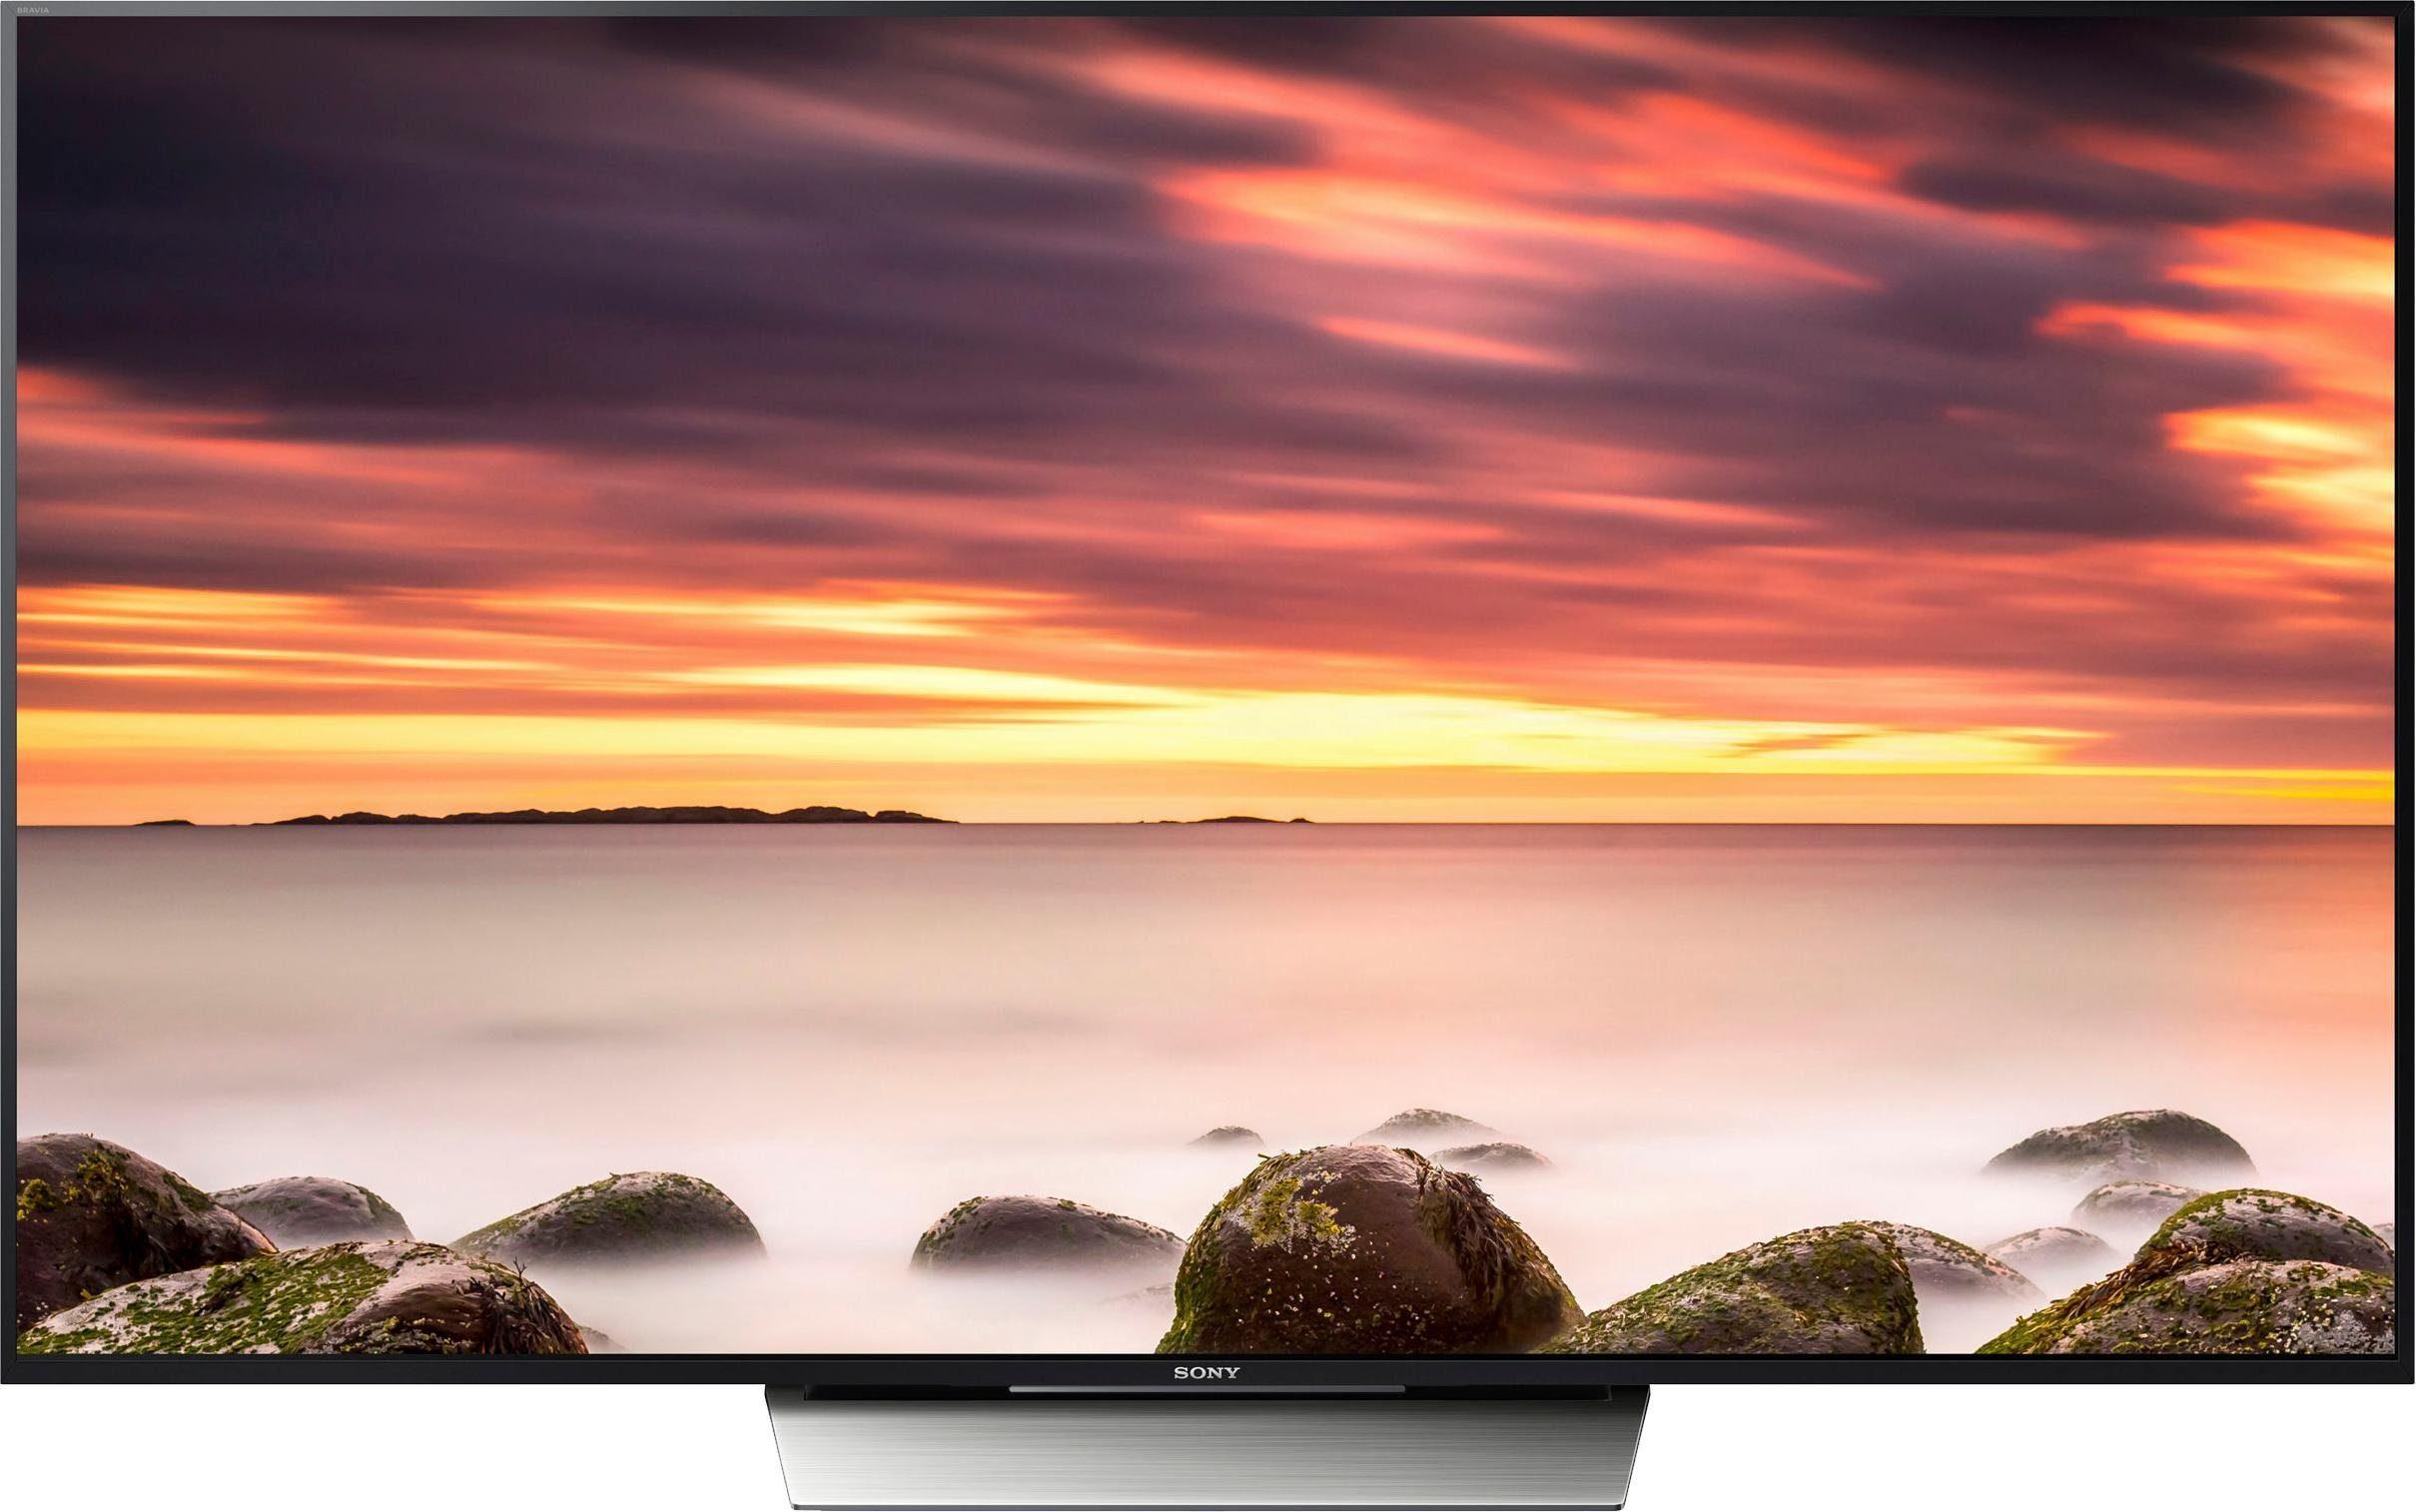 Sony KD65XD8505, mattschwarzer Displayrahmen LED-Fernseher (65 Zoll, 4K Ultra HD)